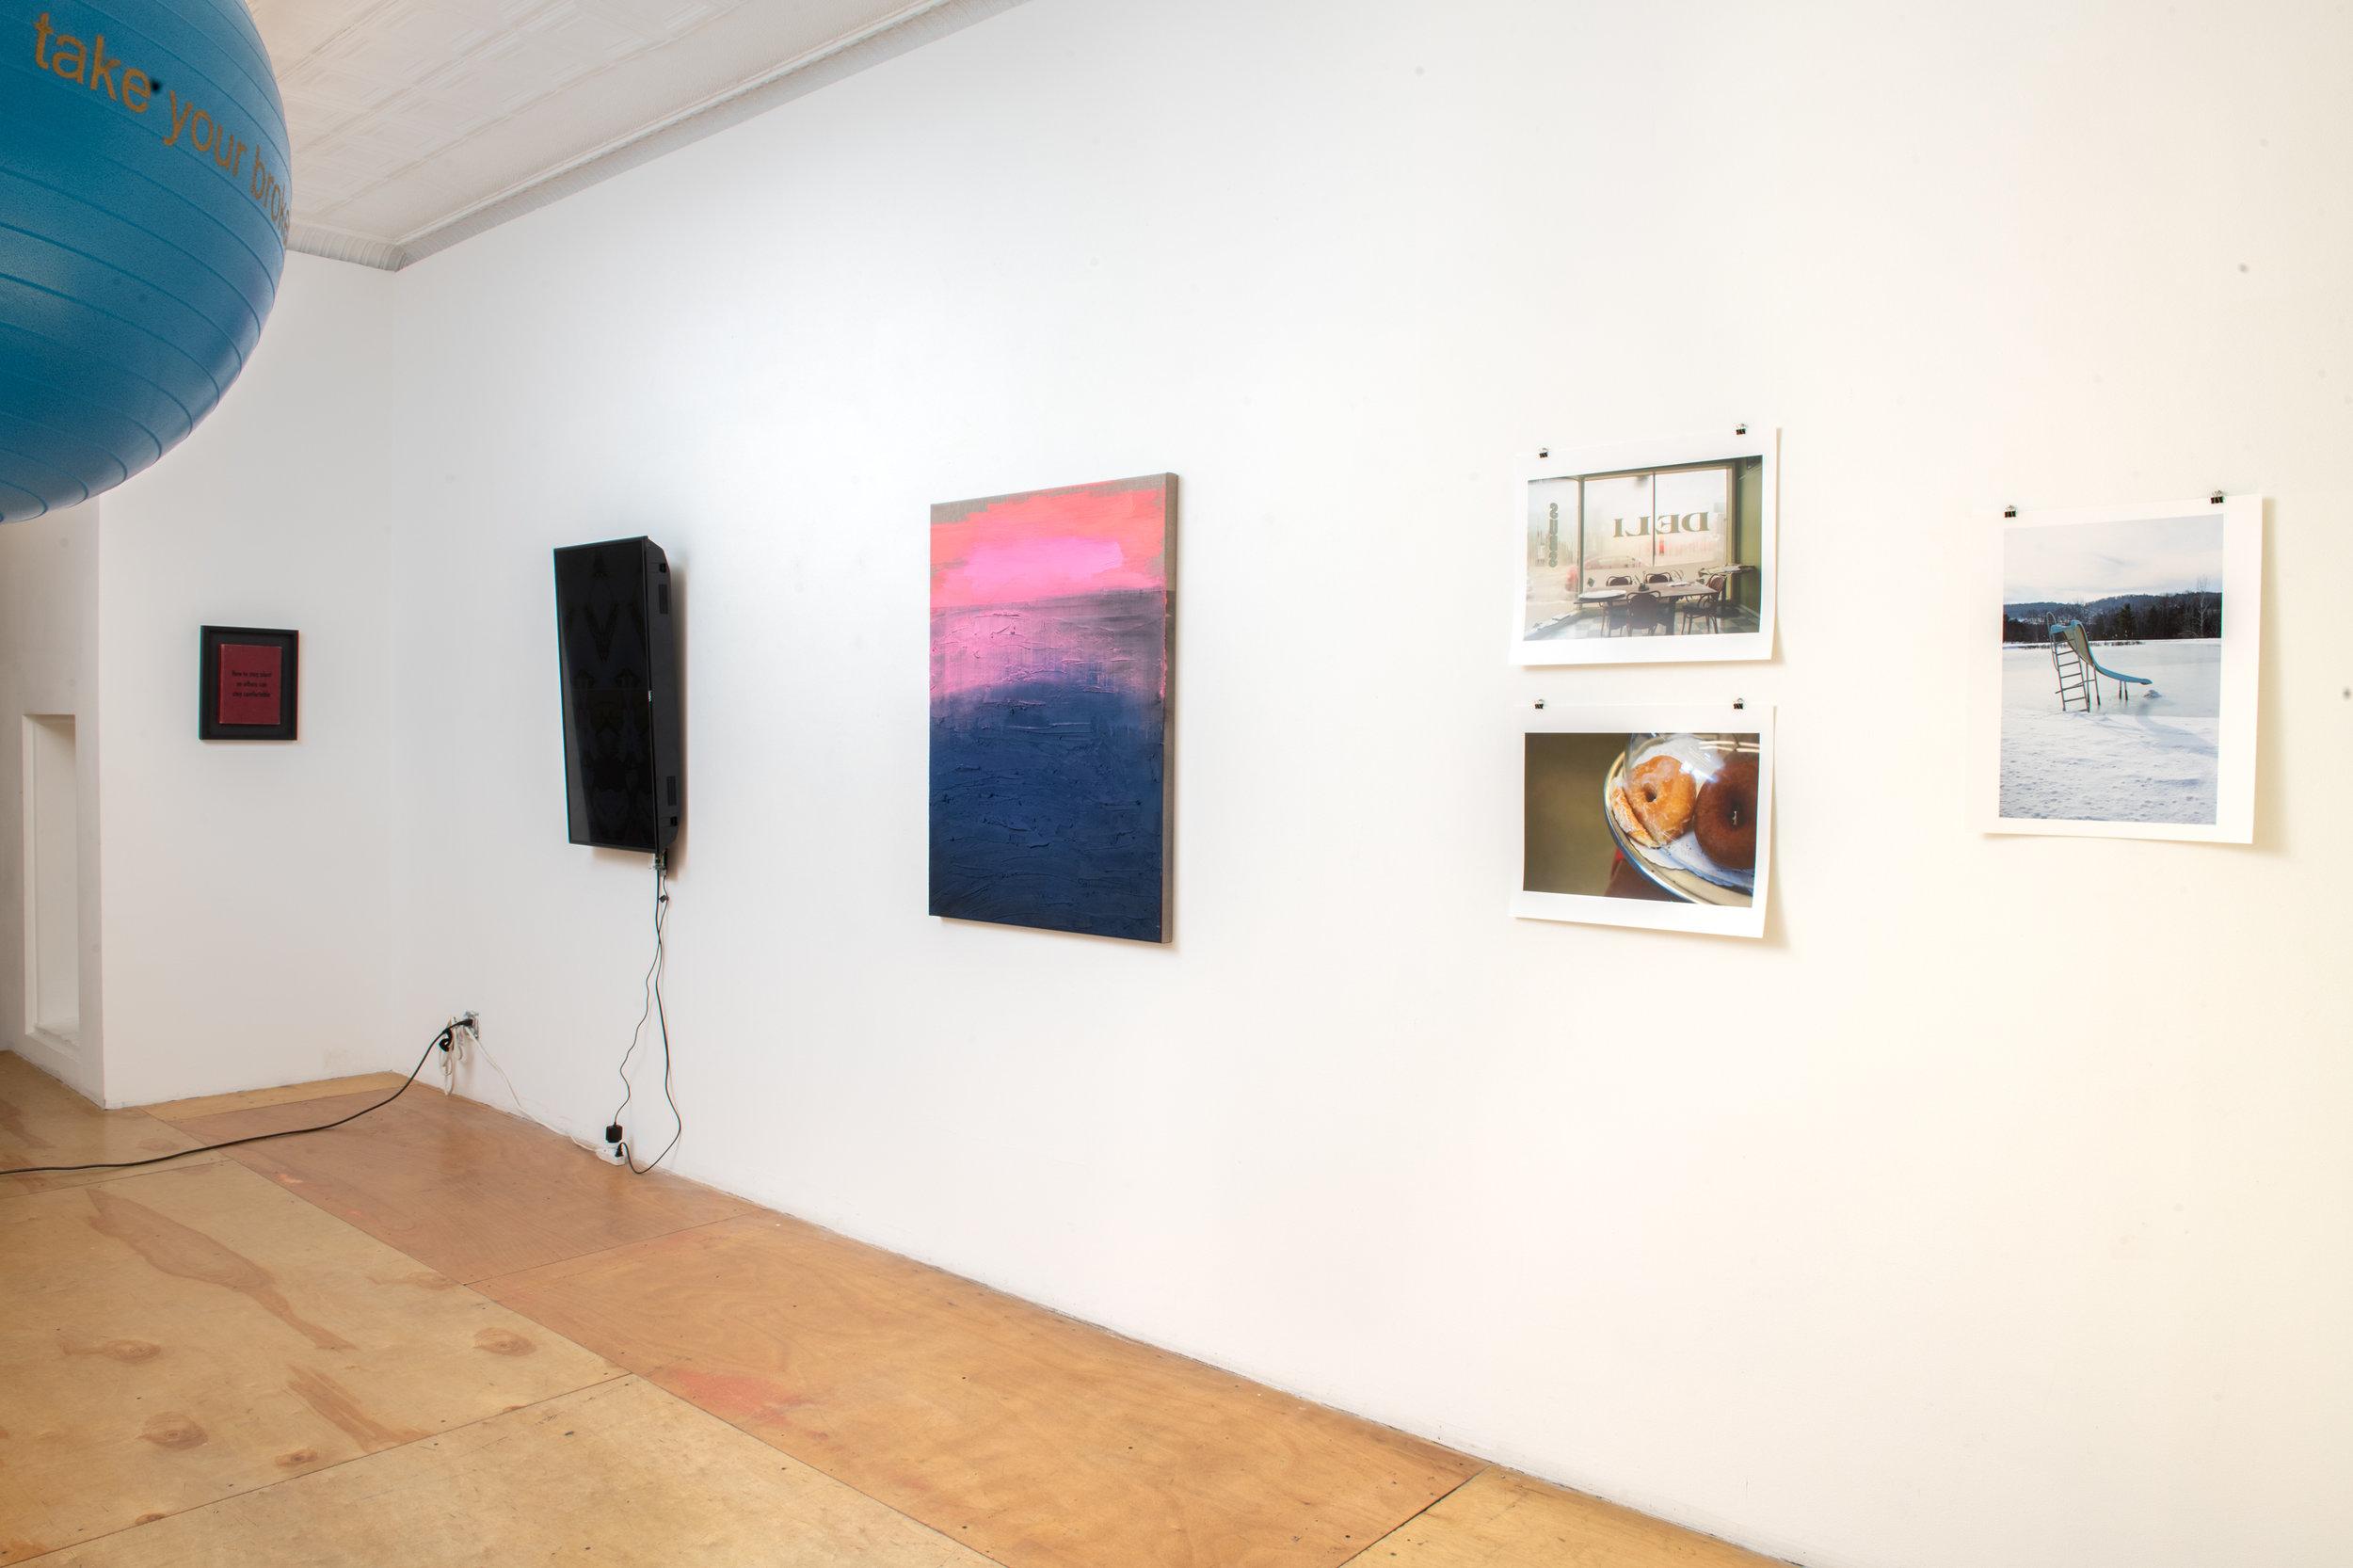 Here + Now Installation view at Pablo's Birthday Focus: Tara Wray, Jonathan Todryk, Tristan Schulze, Irati Inoriza, and Johan Deckmann Photograph by - Edoardo Cozzani